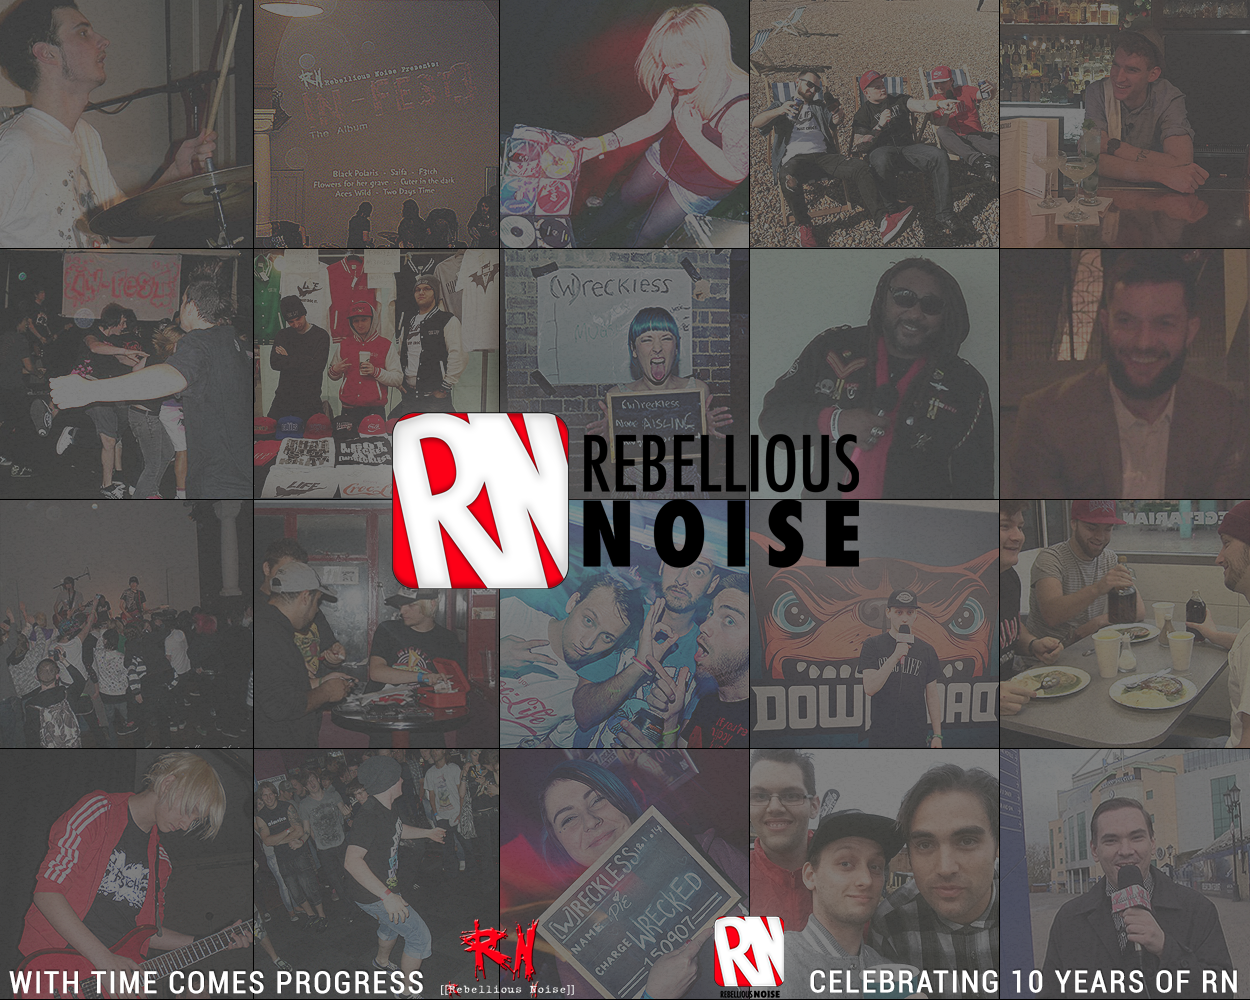 Celebrating 10 years of Rebellious Noise